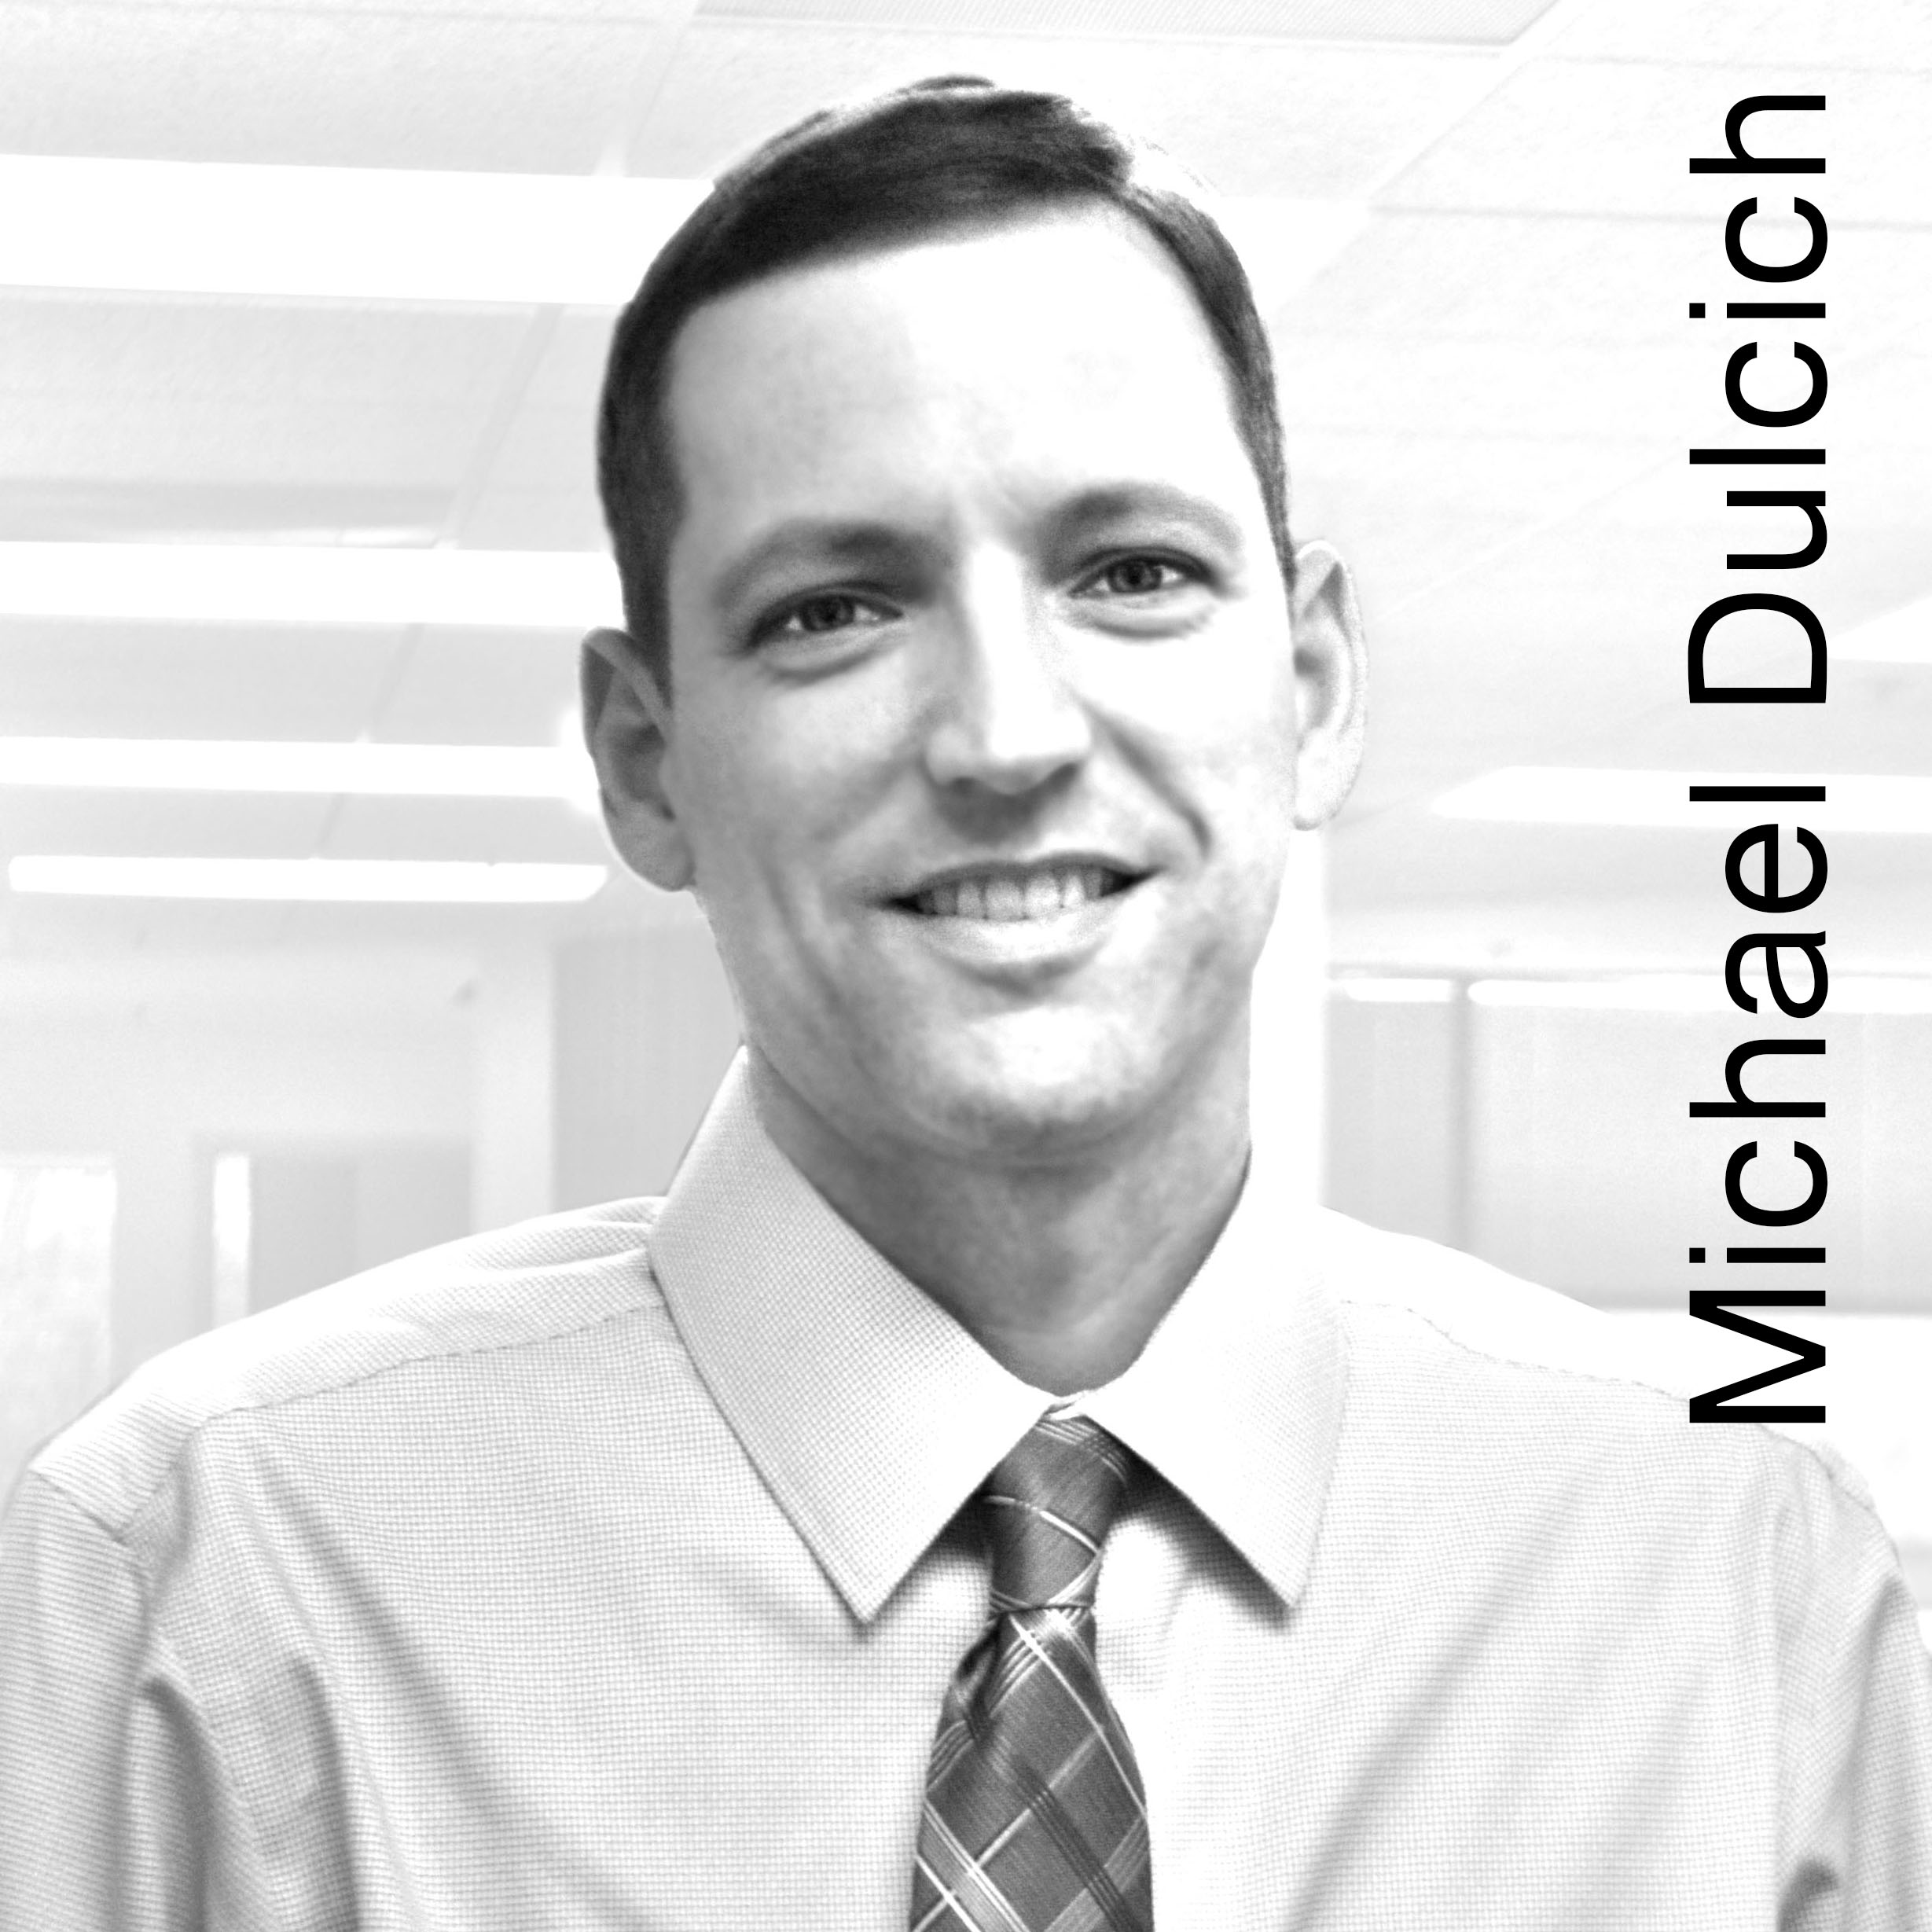 michael_dulcich_square.jpg